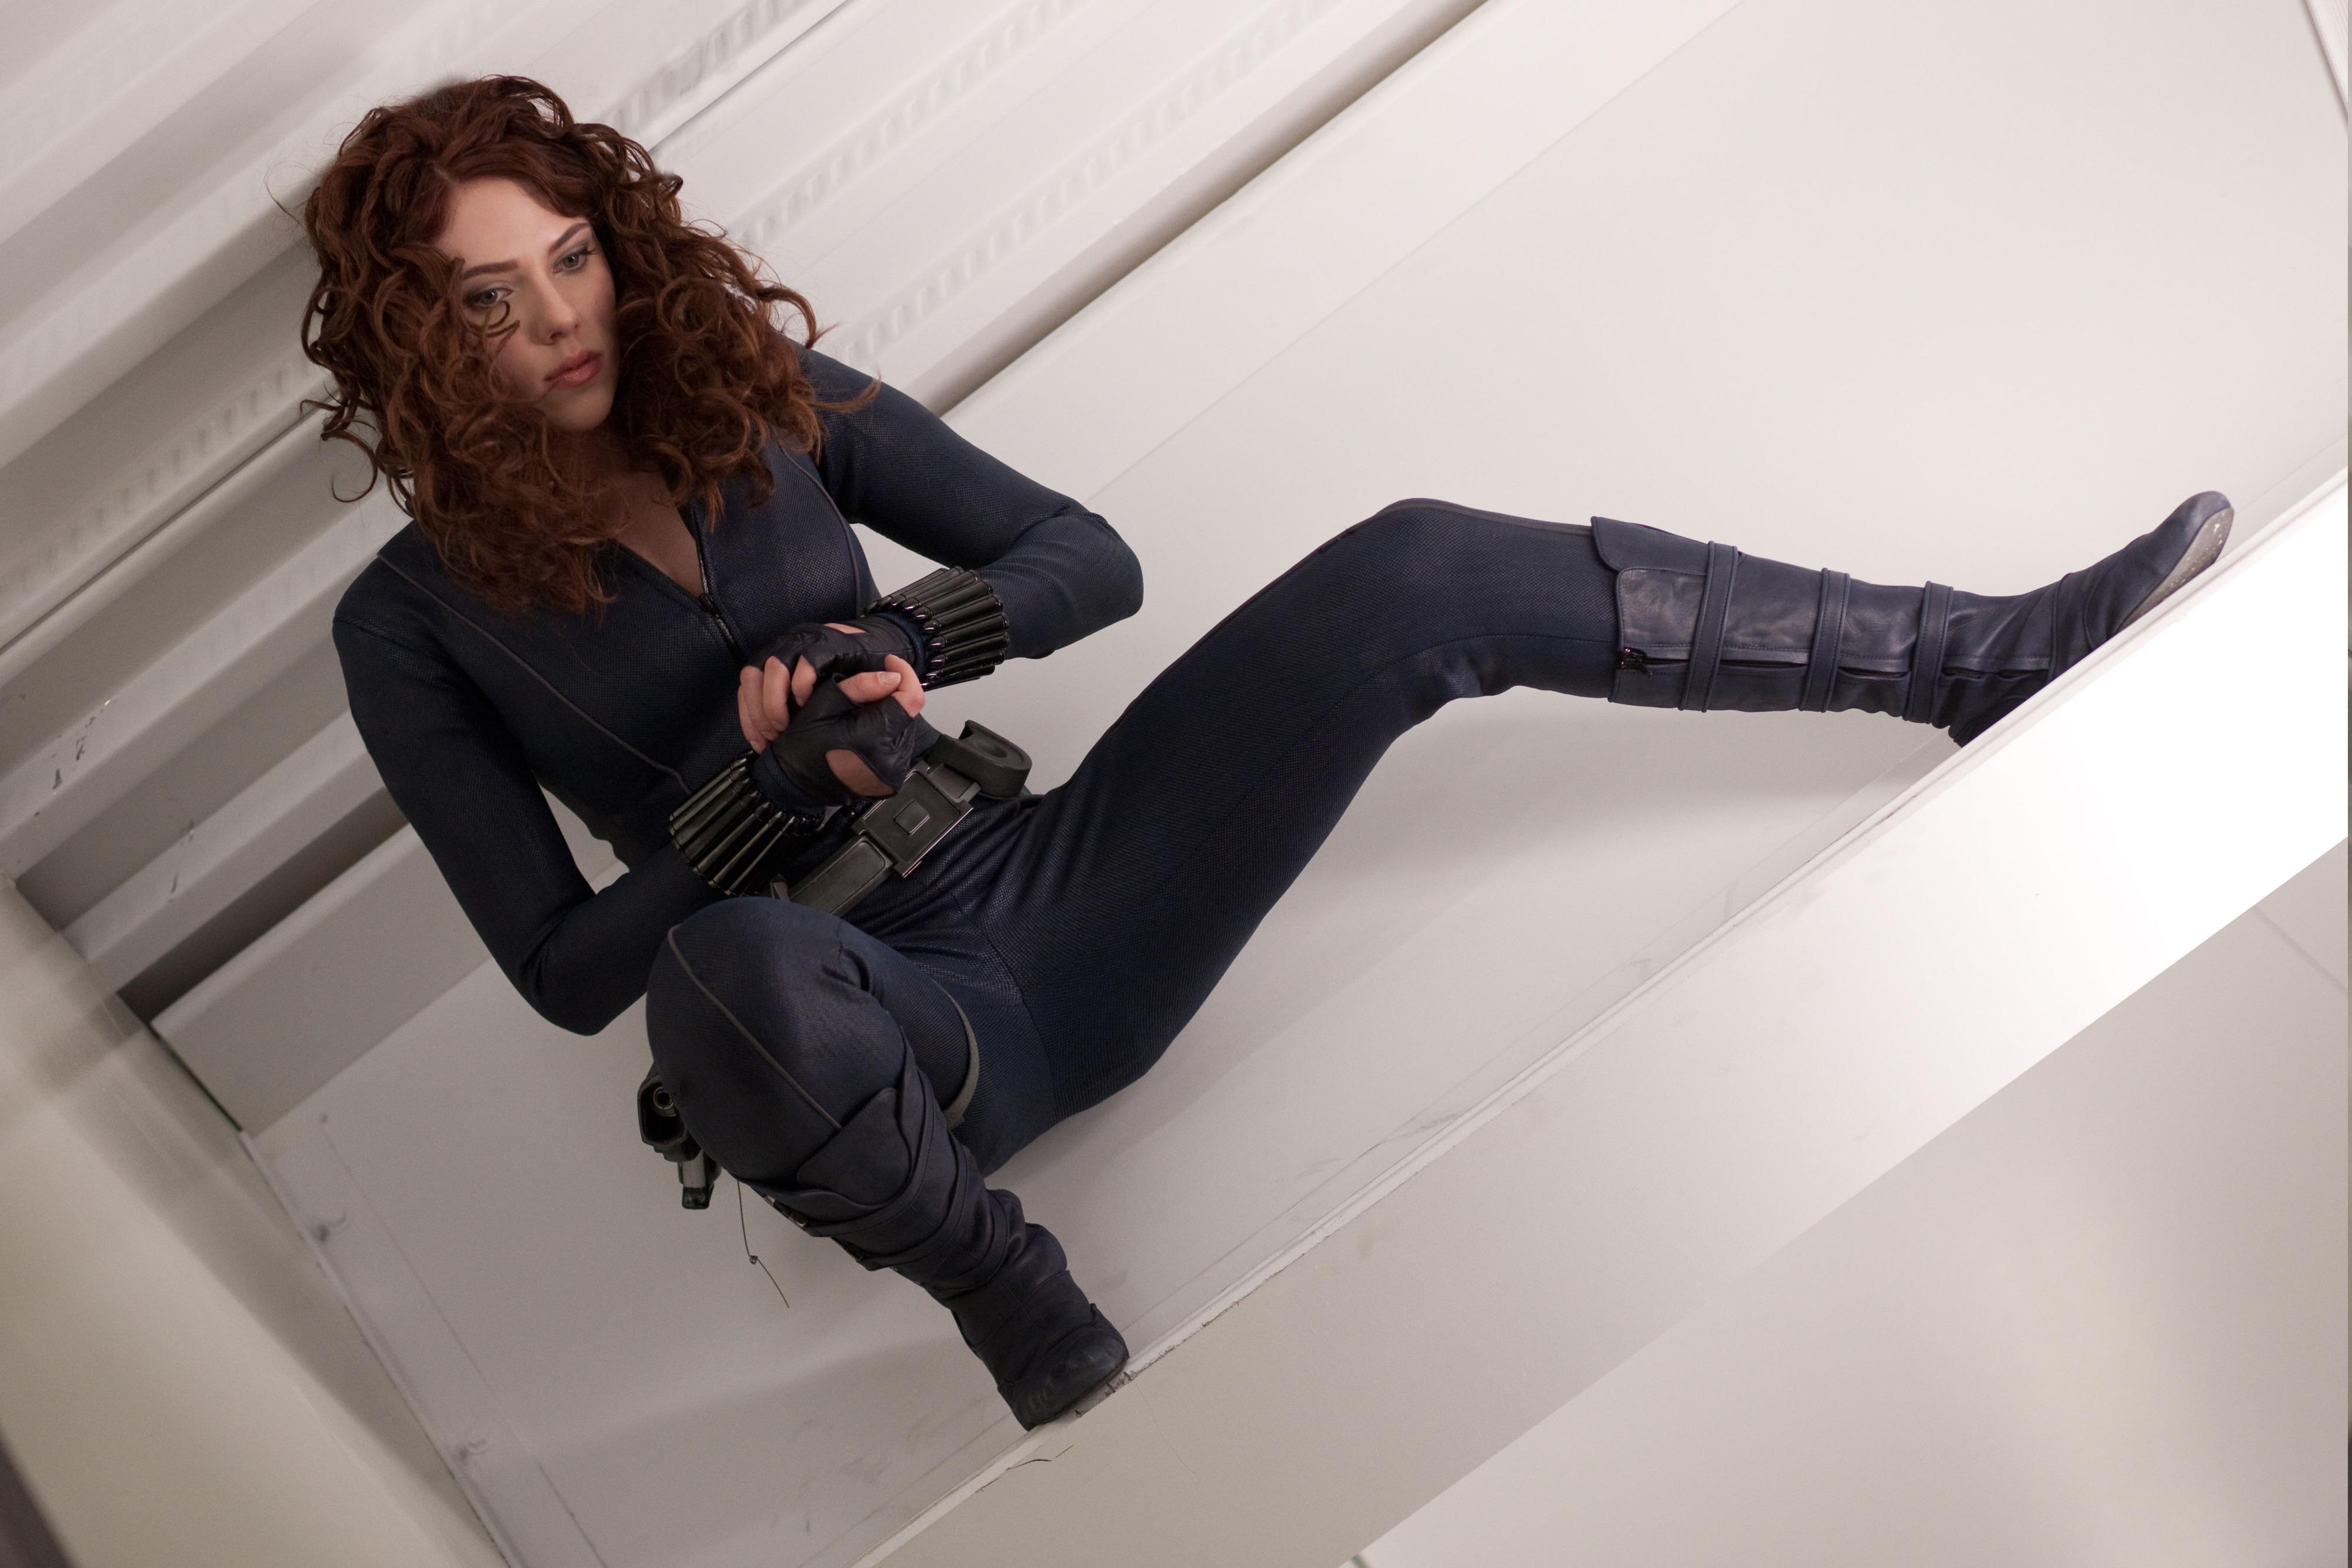 Wallpaper : 3999x2666 px, actress, Black Widow, Iron Man 2